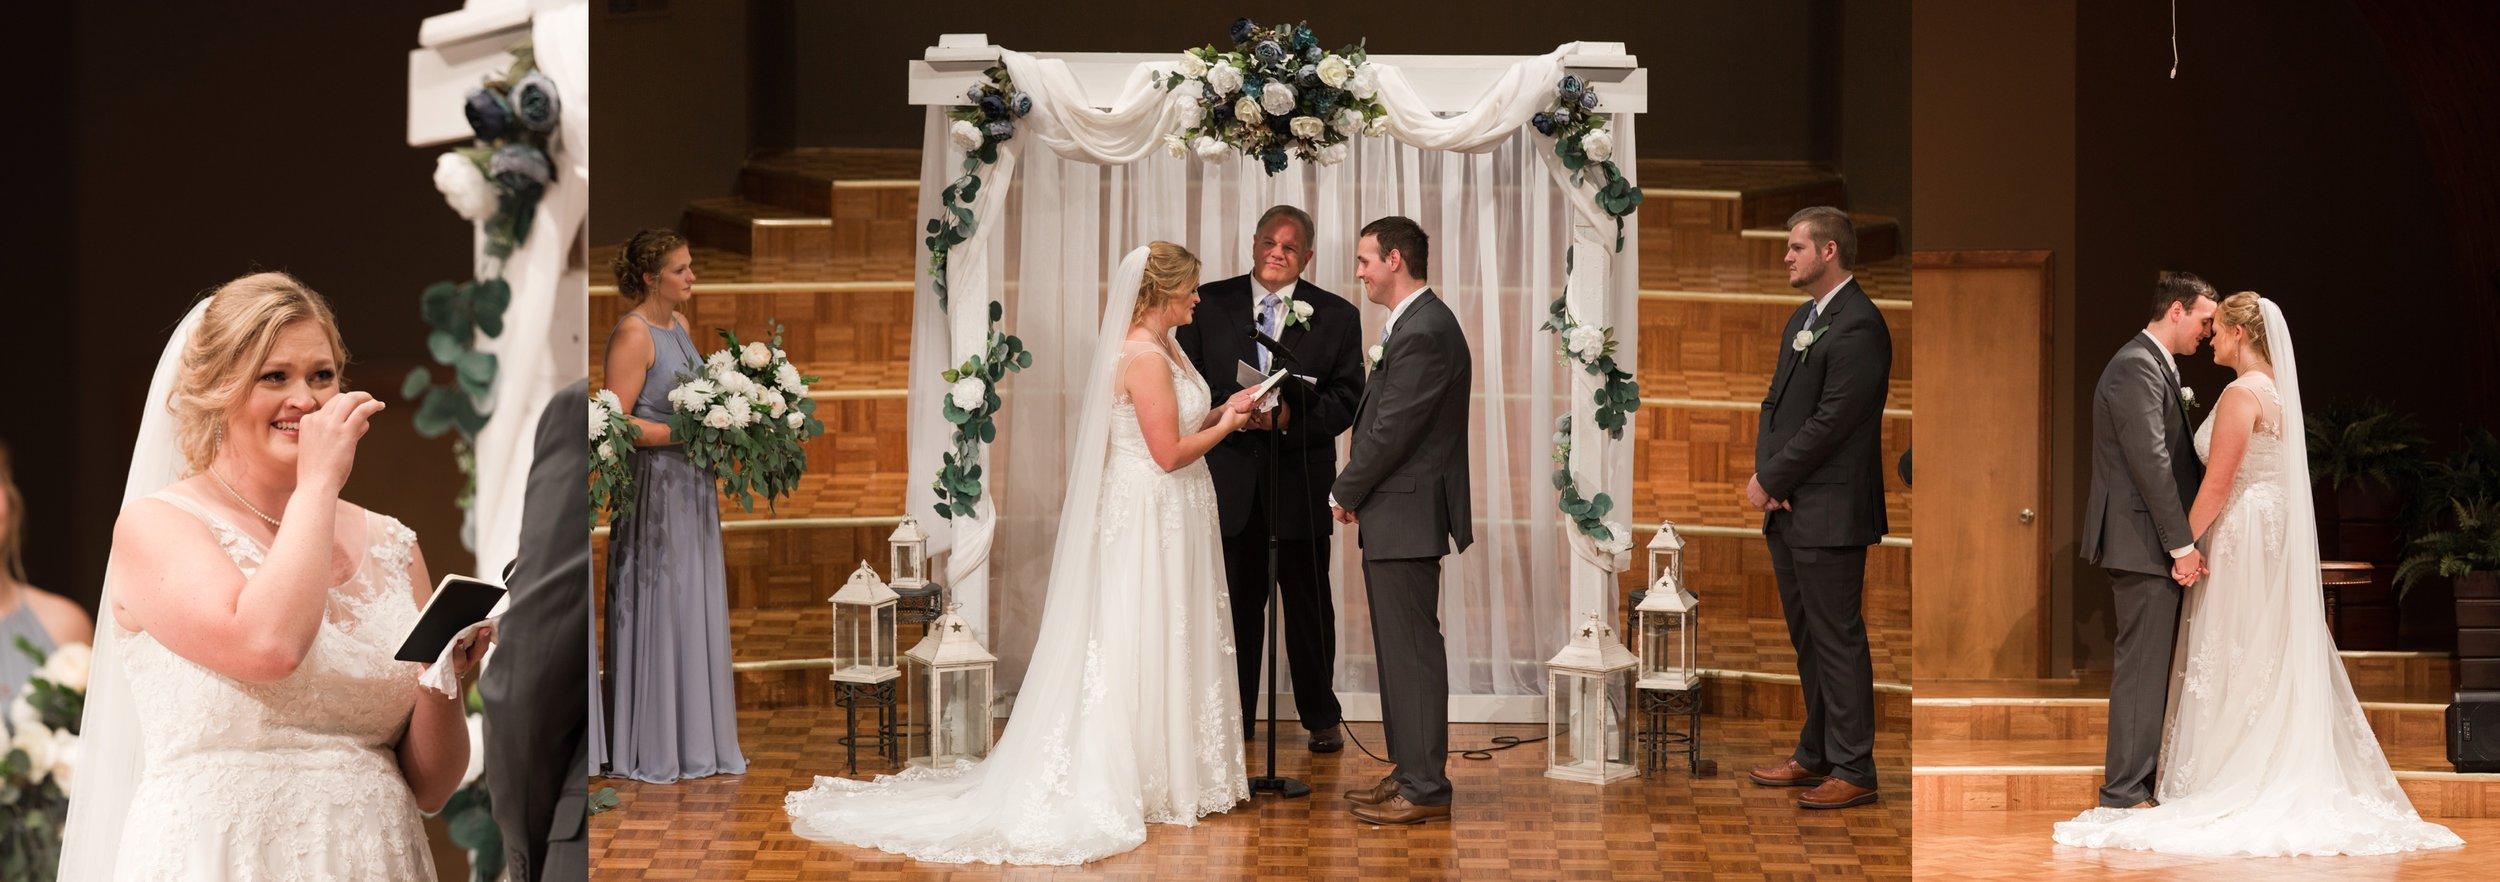 Brand-Fleenor-Wedding-ByJessicaMcBroom